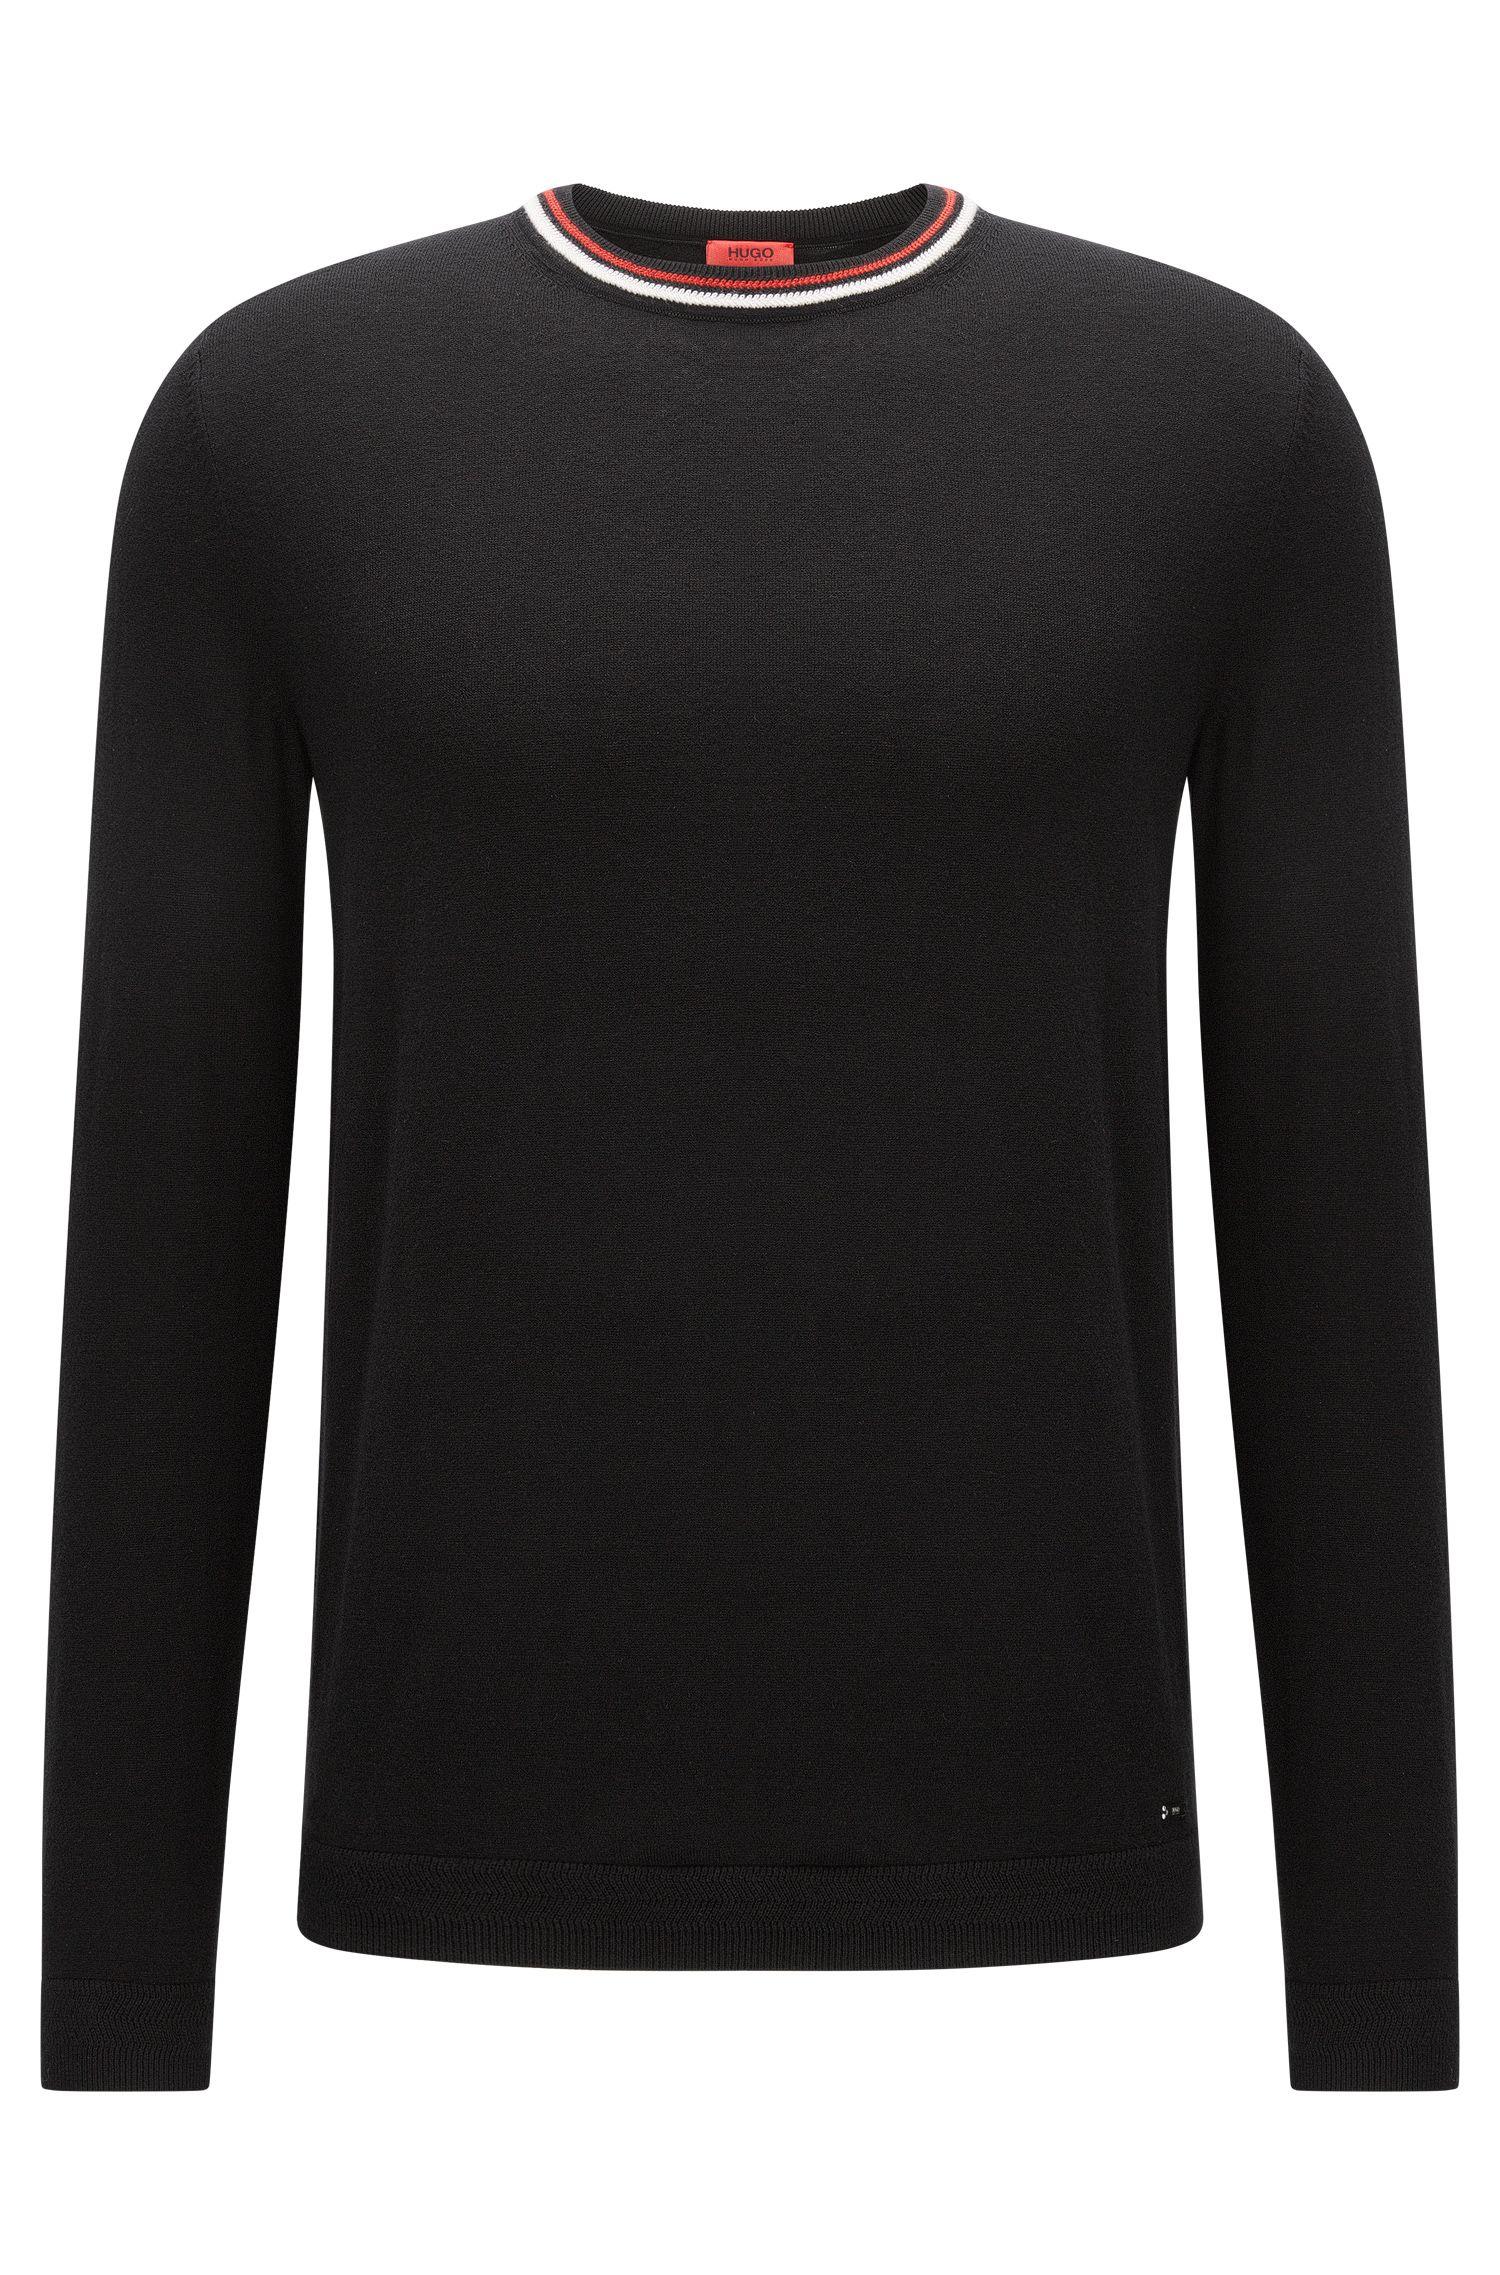 Cotton-Cashmere Sweater   Sabo